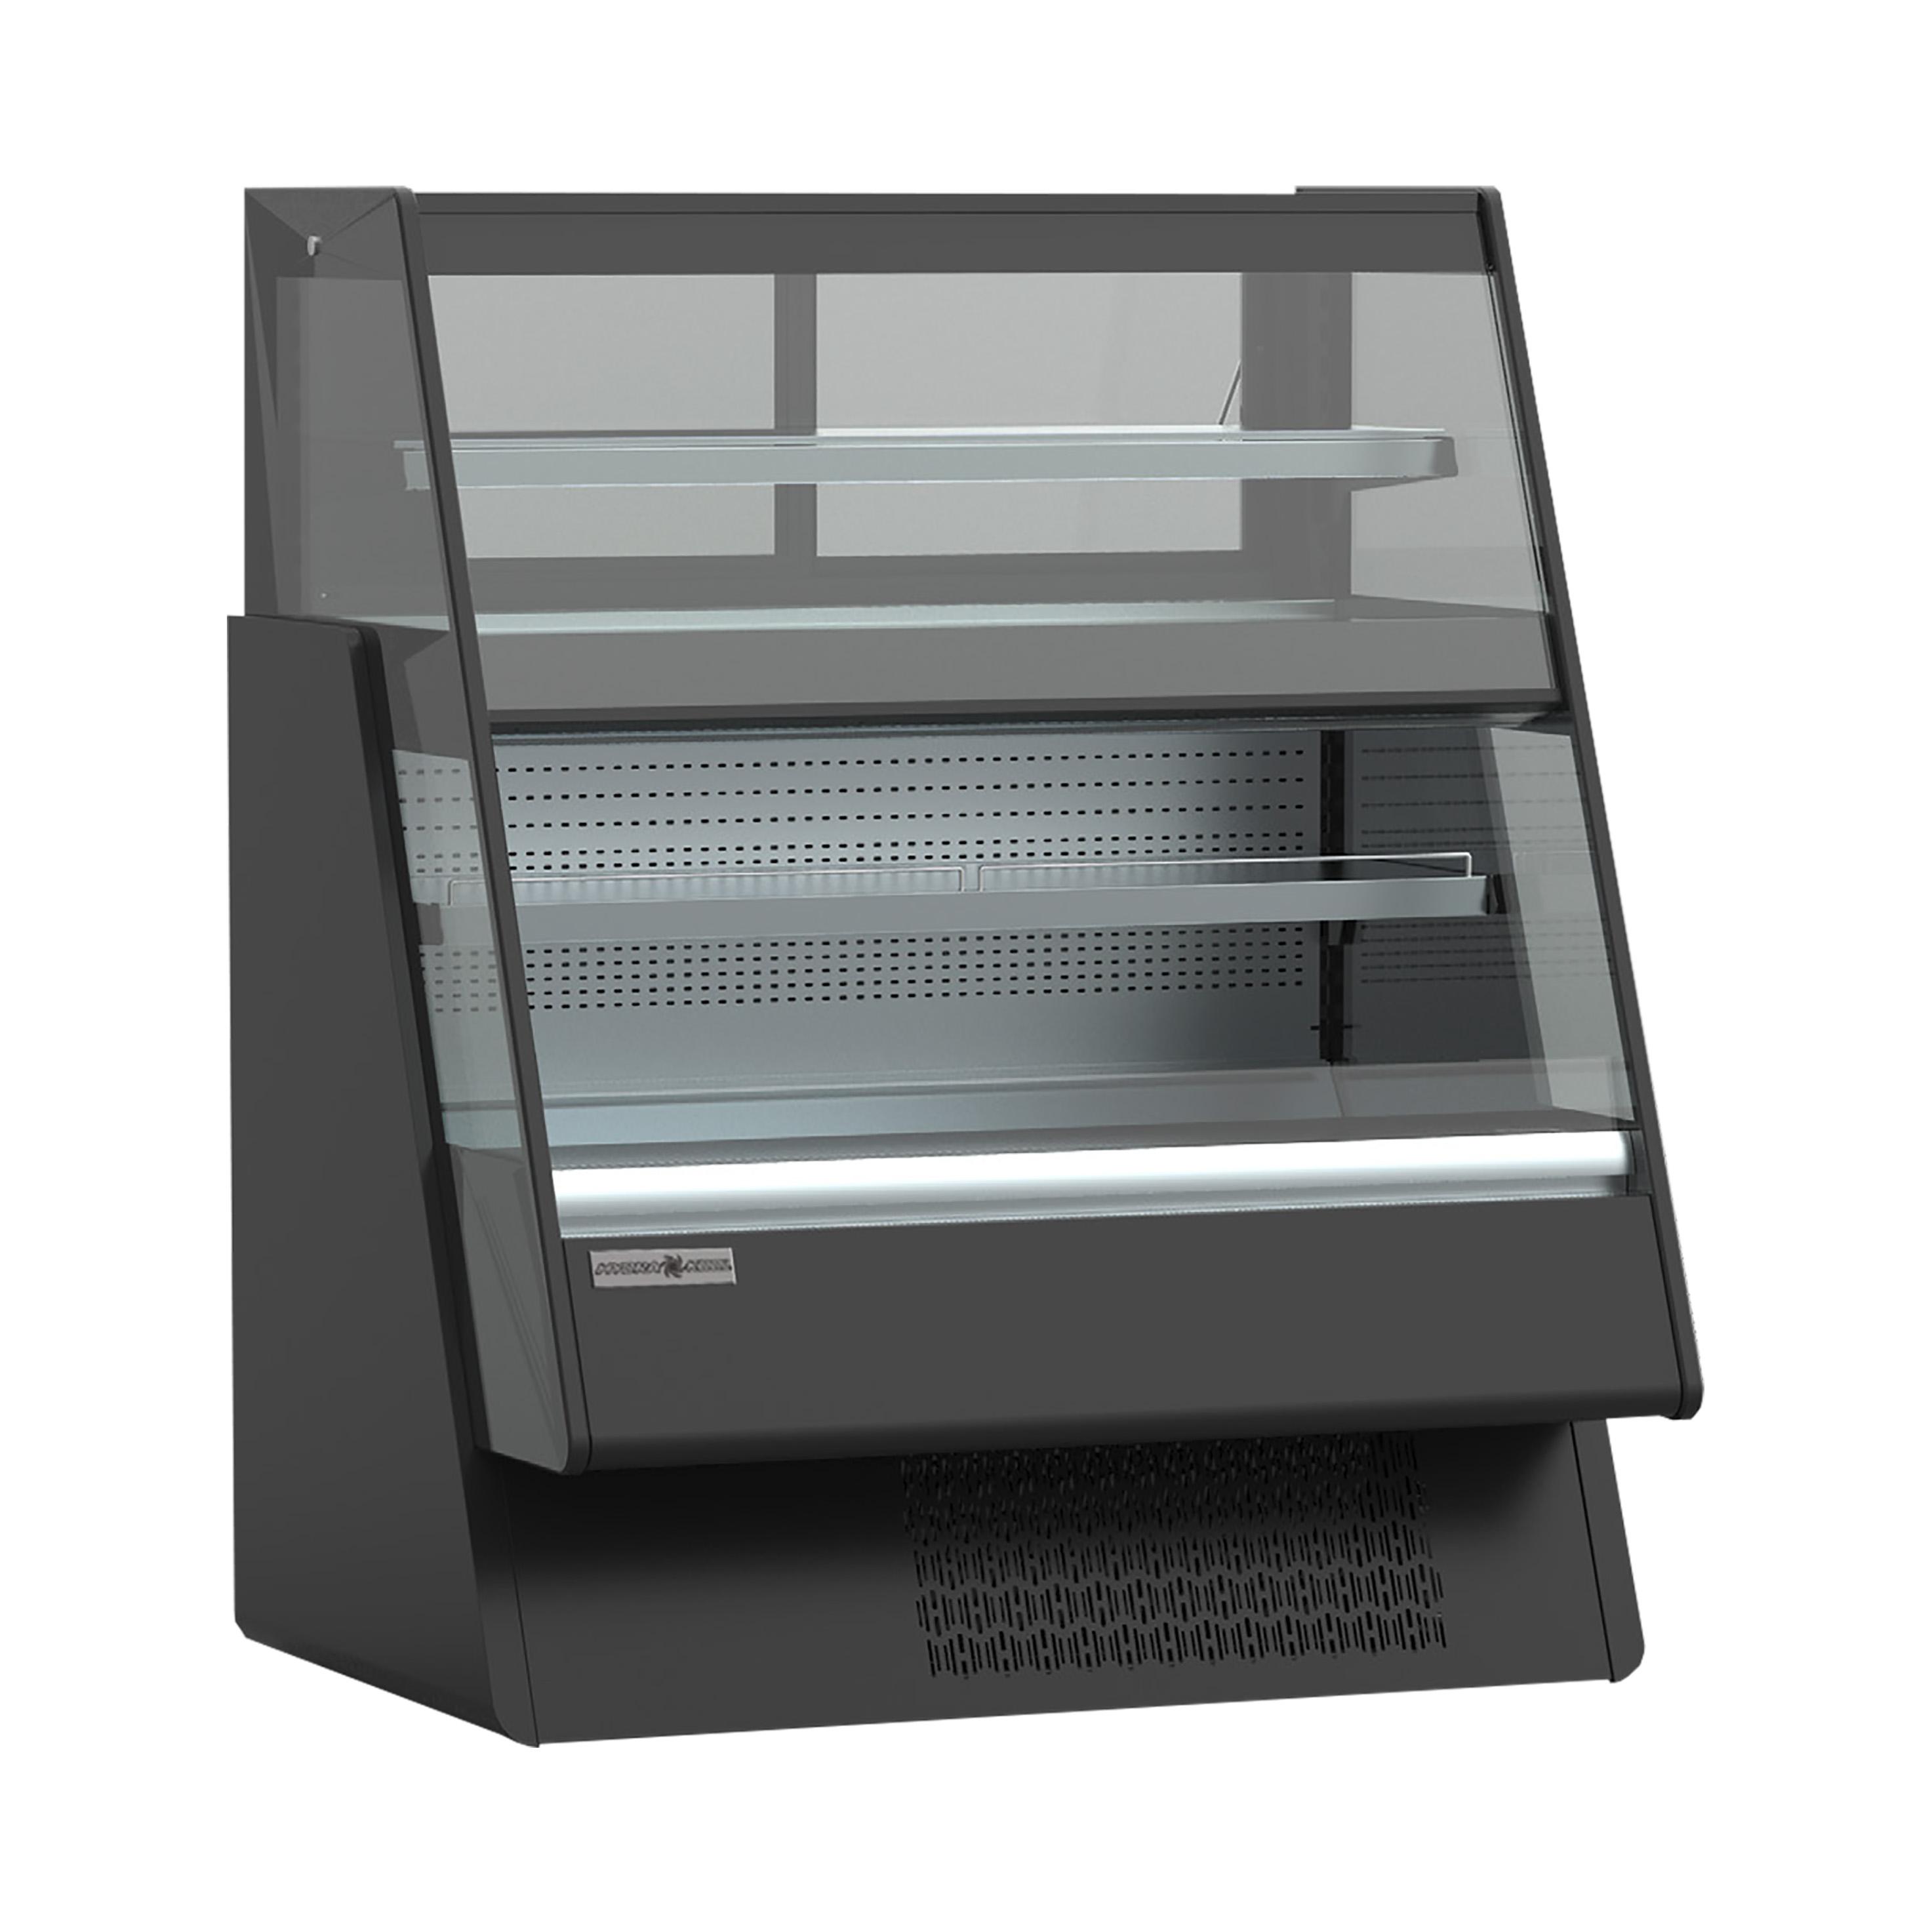 MVP KGL-OU-36-S merchandiser, open refrigerated display